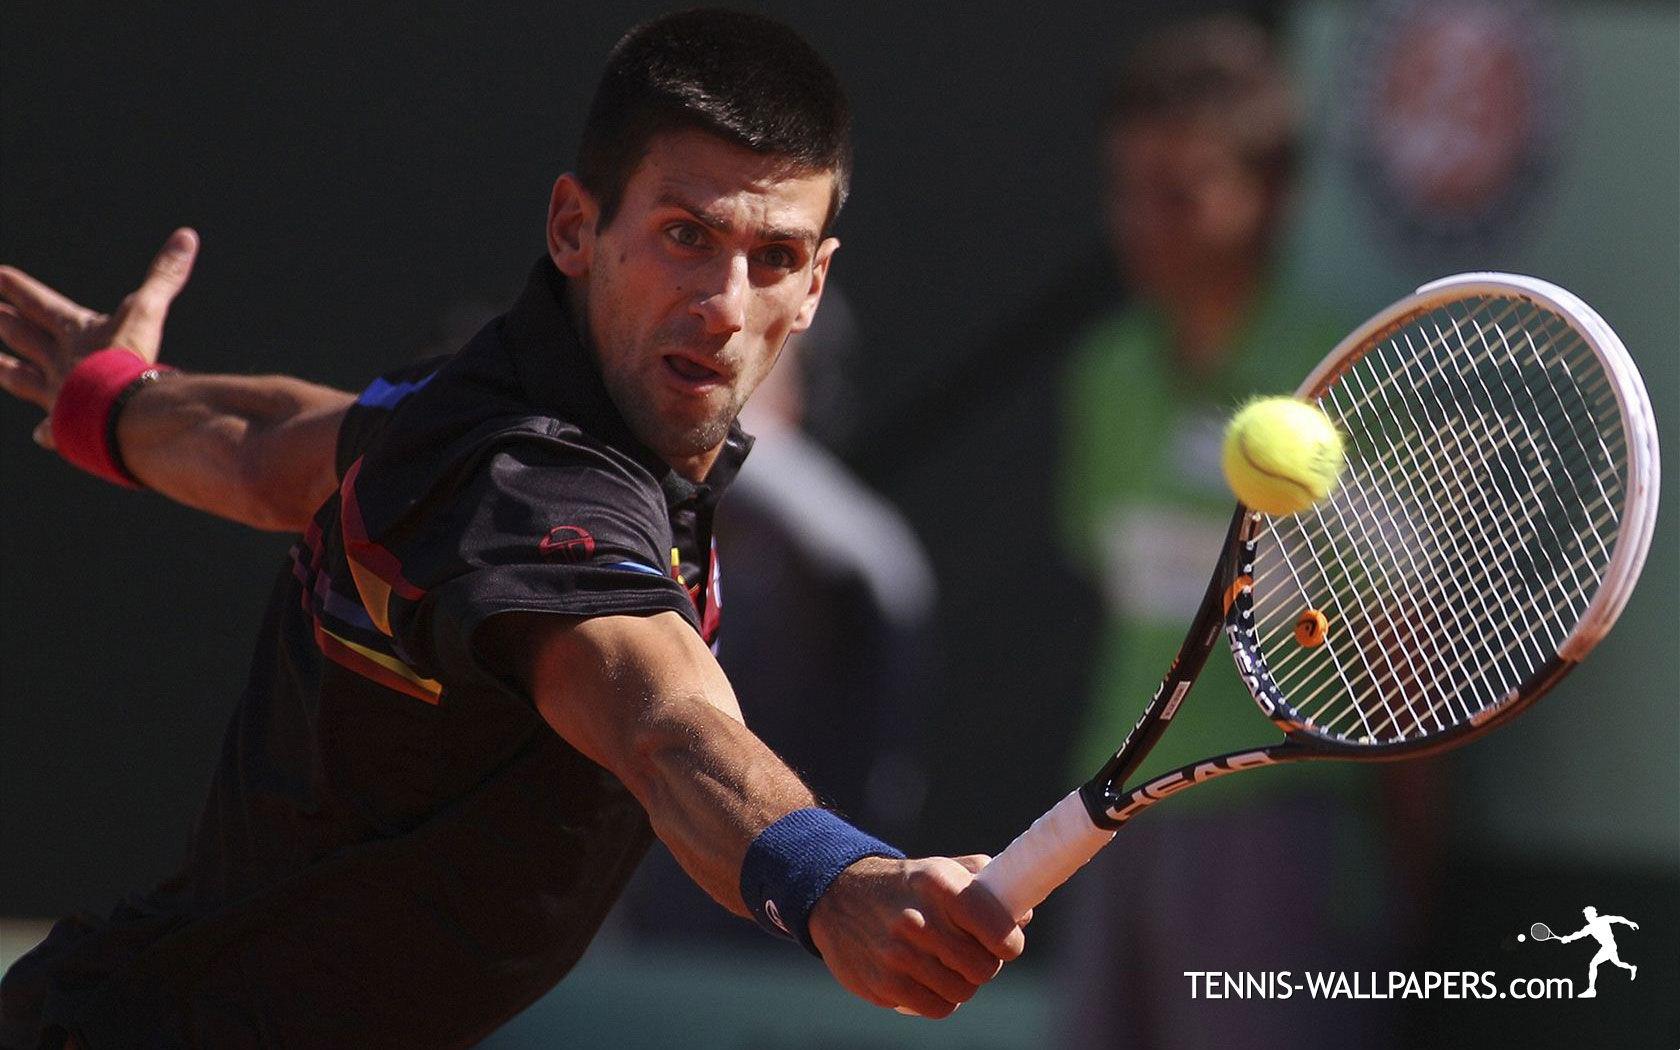 Novak Djokovic Wallpapers and Desktop Backgrounds Page 3 1680x1050